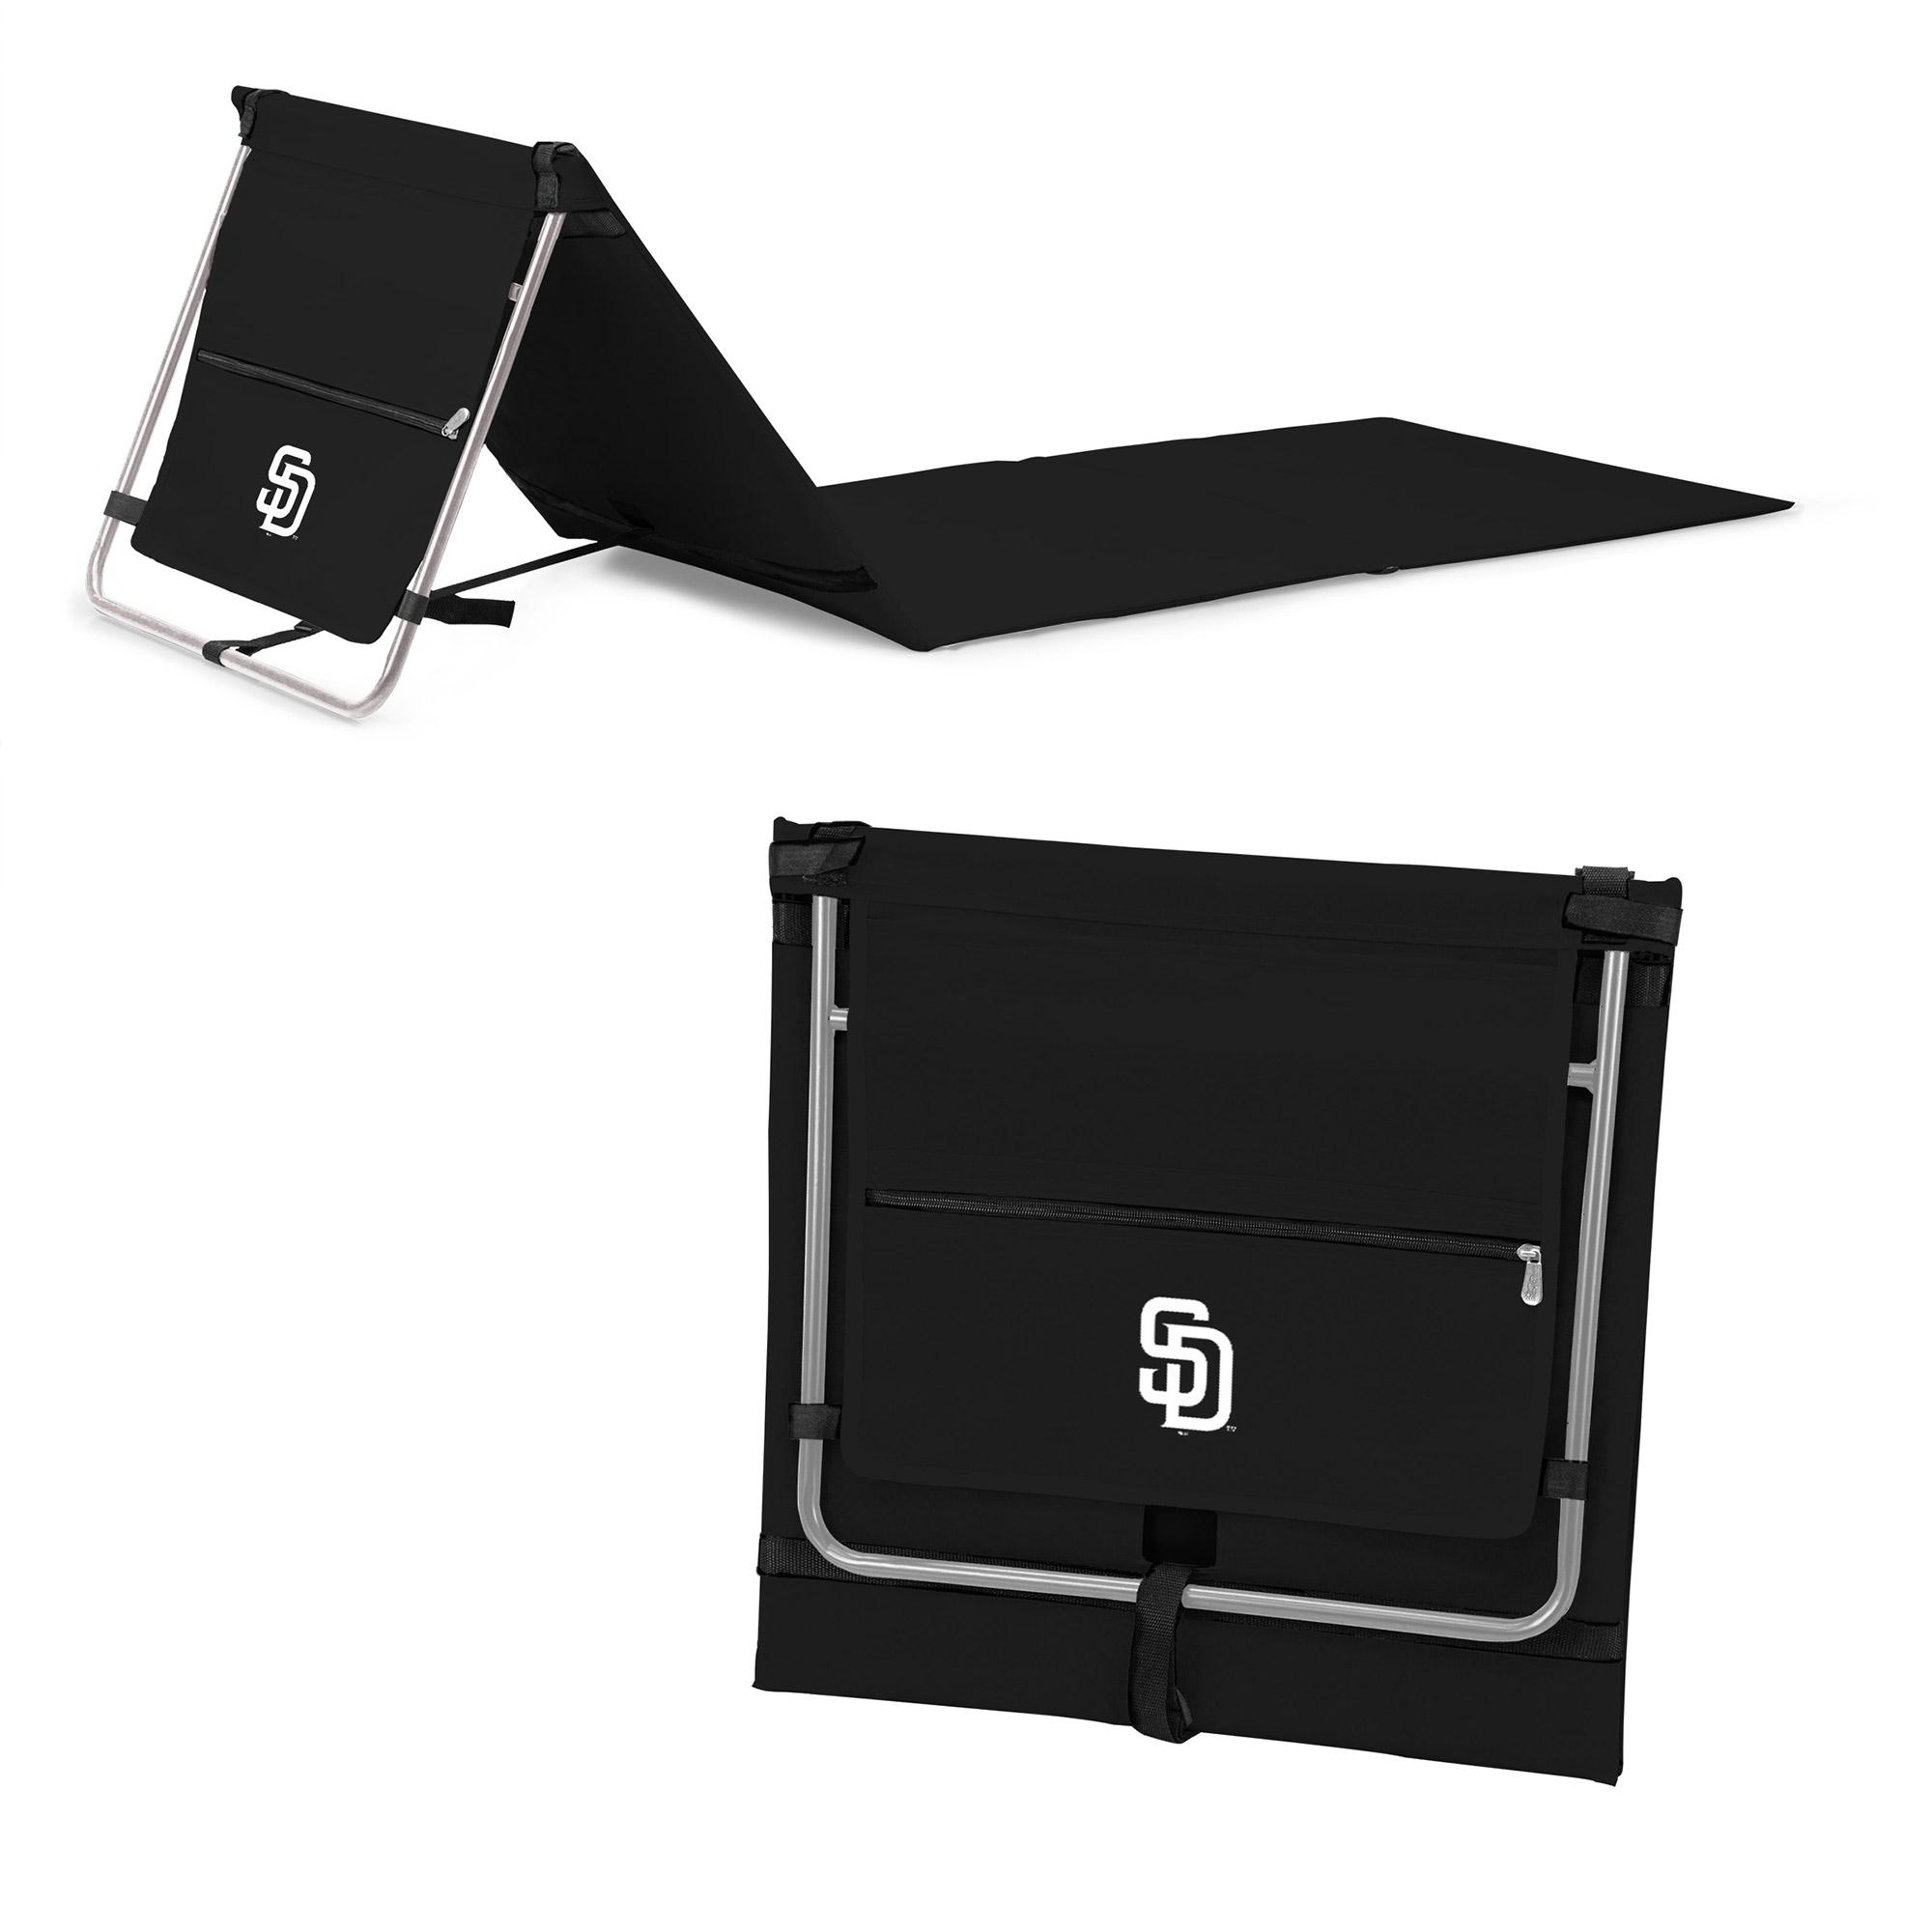 San Diego Padres Portable Lounger Beach Mat - Black - No Size